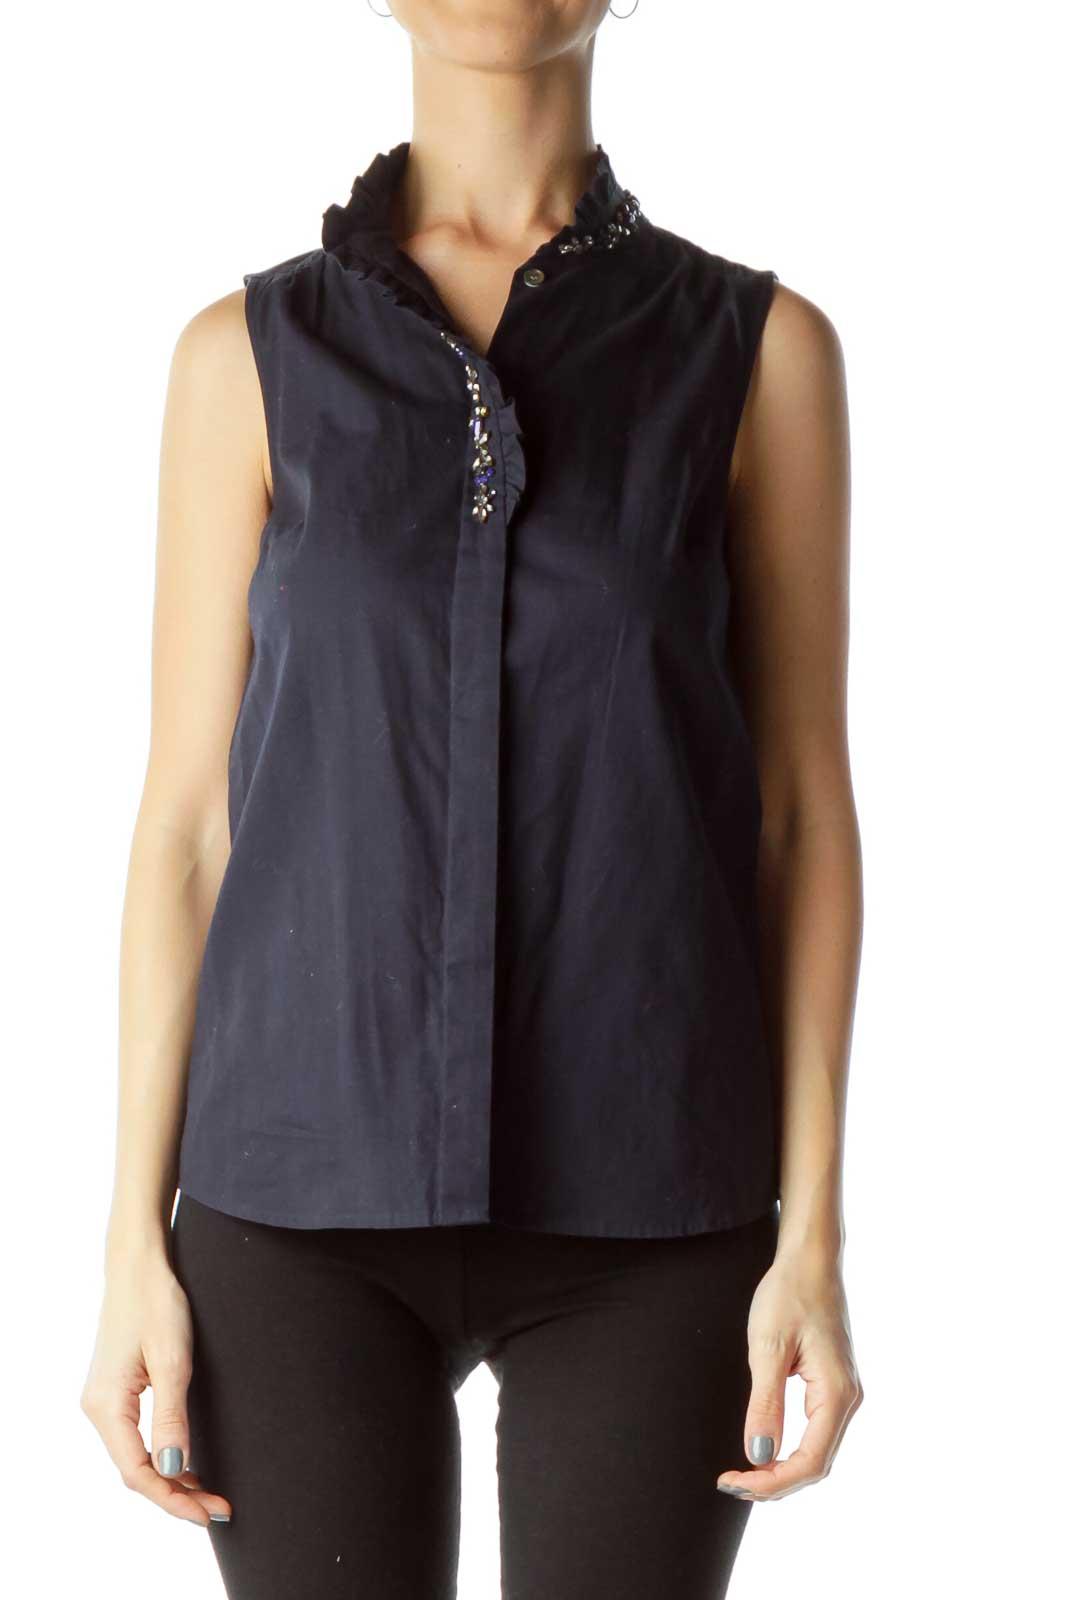 Navy Sleeveless Shirt with Jewel Detail